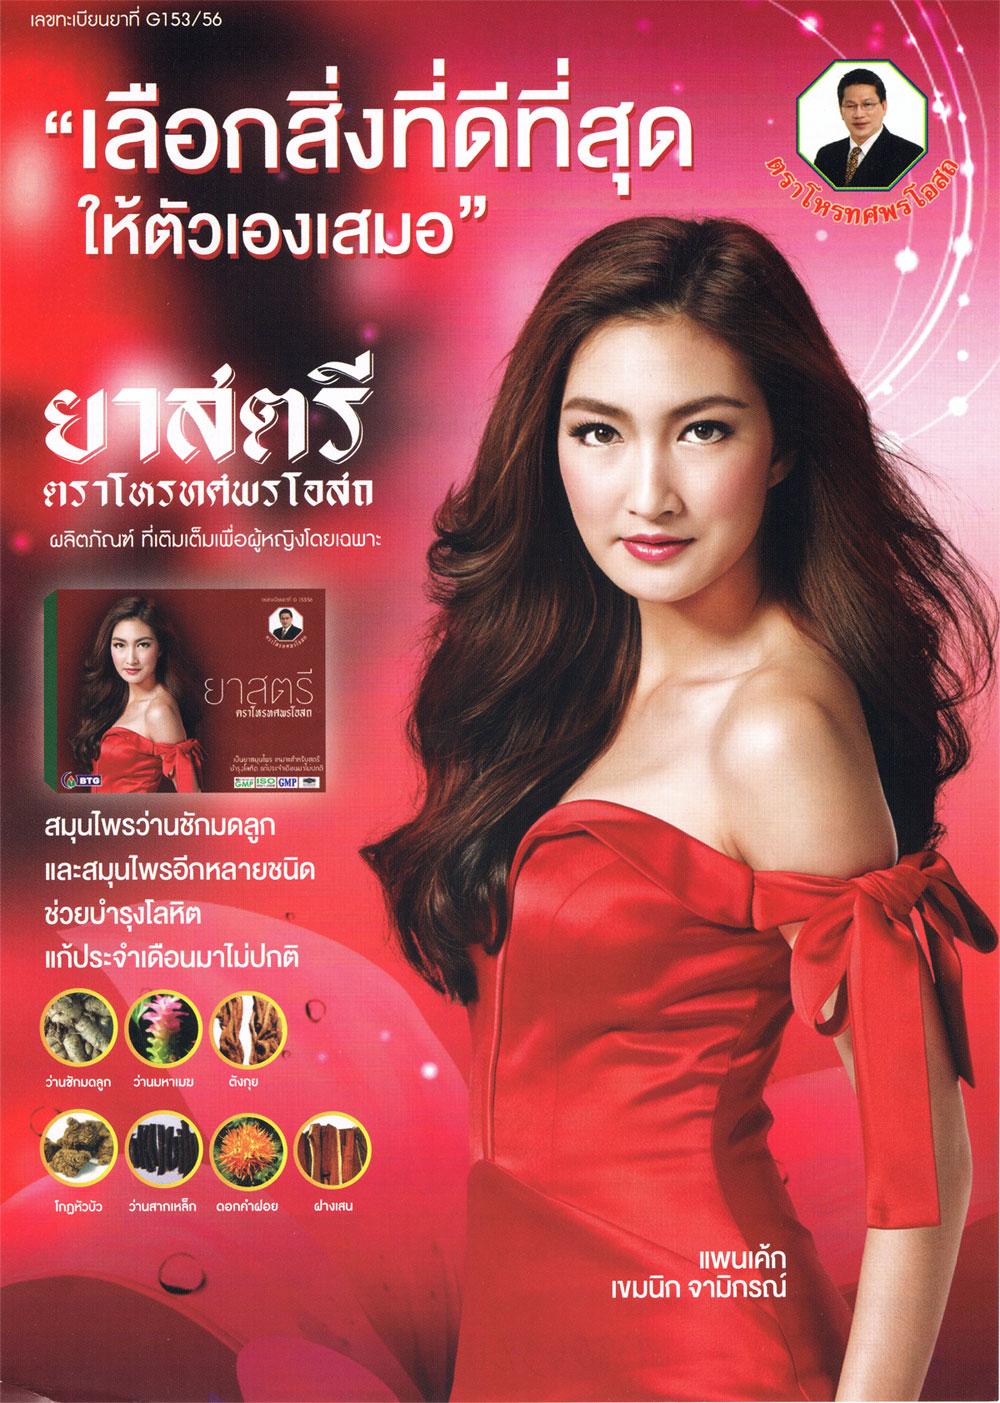 Asian beauty secrets. Thai herbal health.